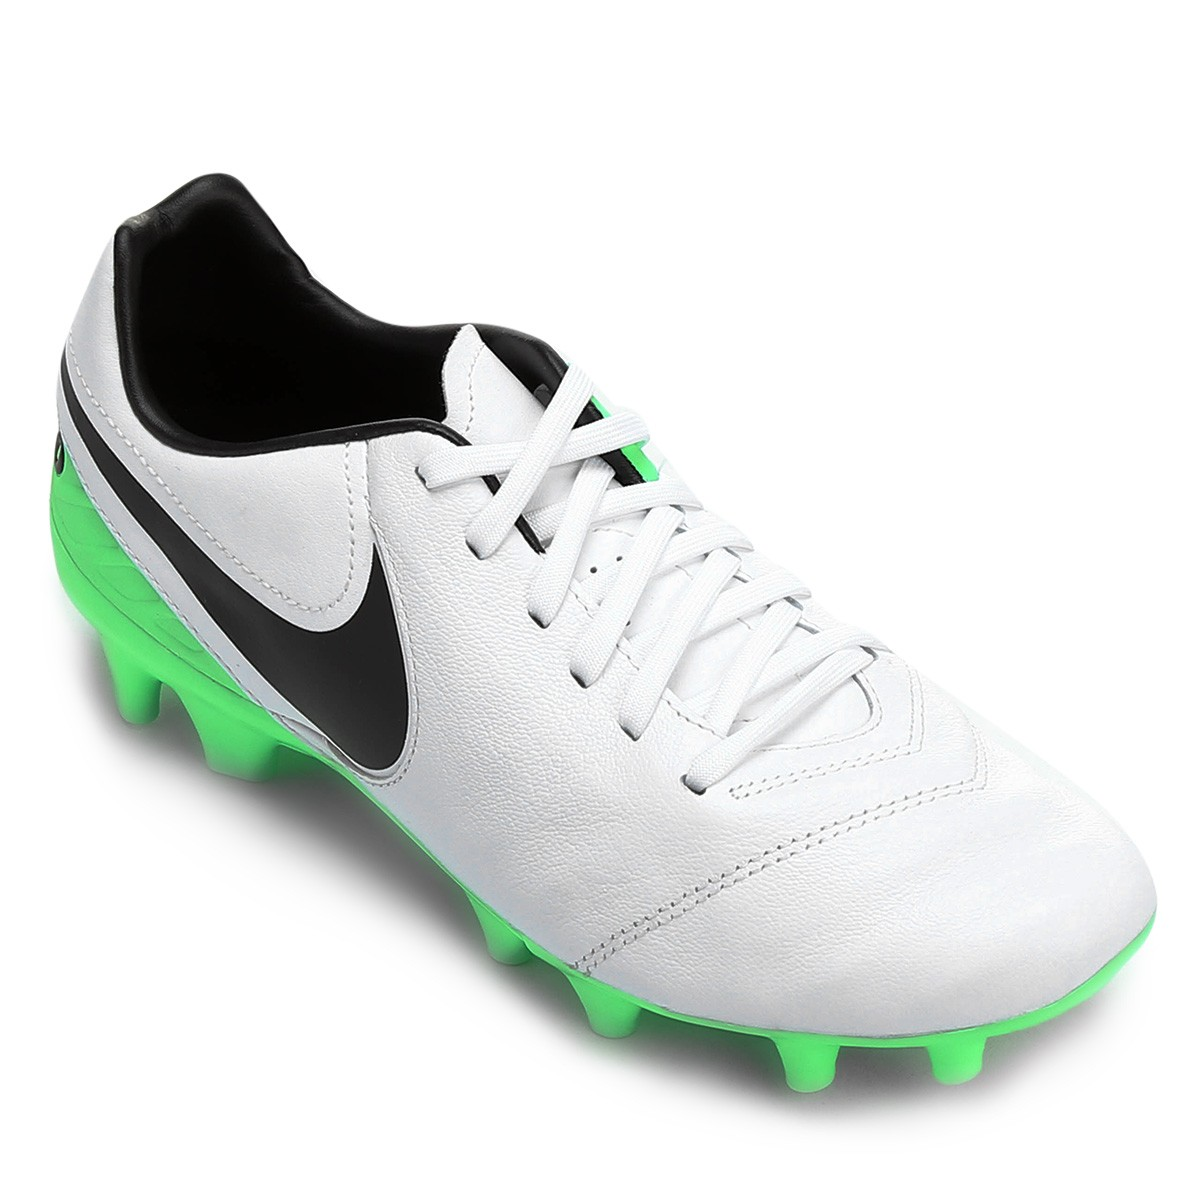 0bb7ea18ae Chuteira Nike Campo Tiempo Mystic V FG 819236-103 - Branco Verde ...